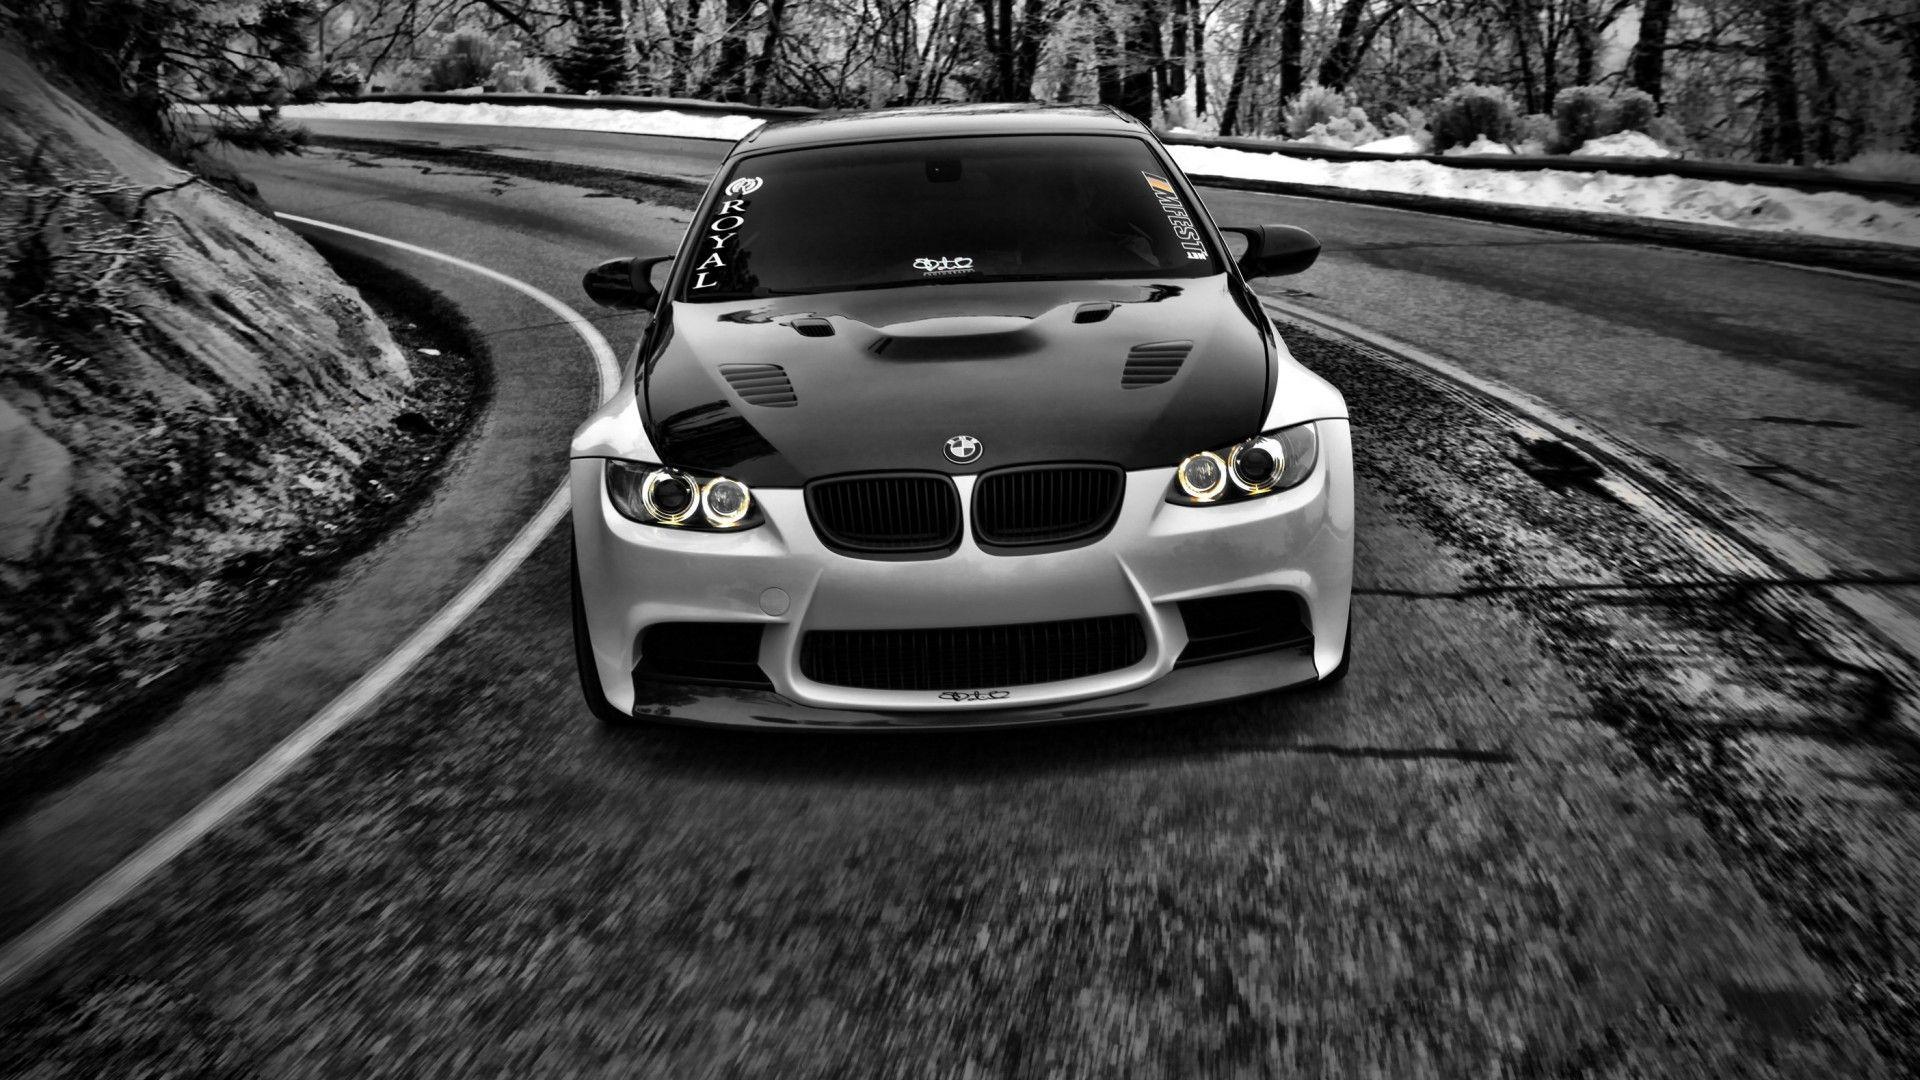 Bmw Car Hd Wallpaper 1080p Bmw Black And White Cars Car Hd